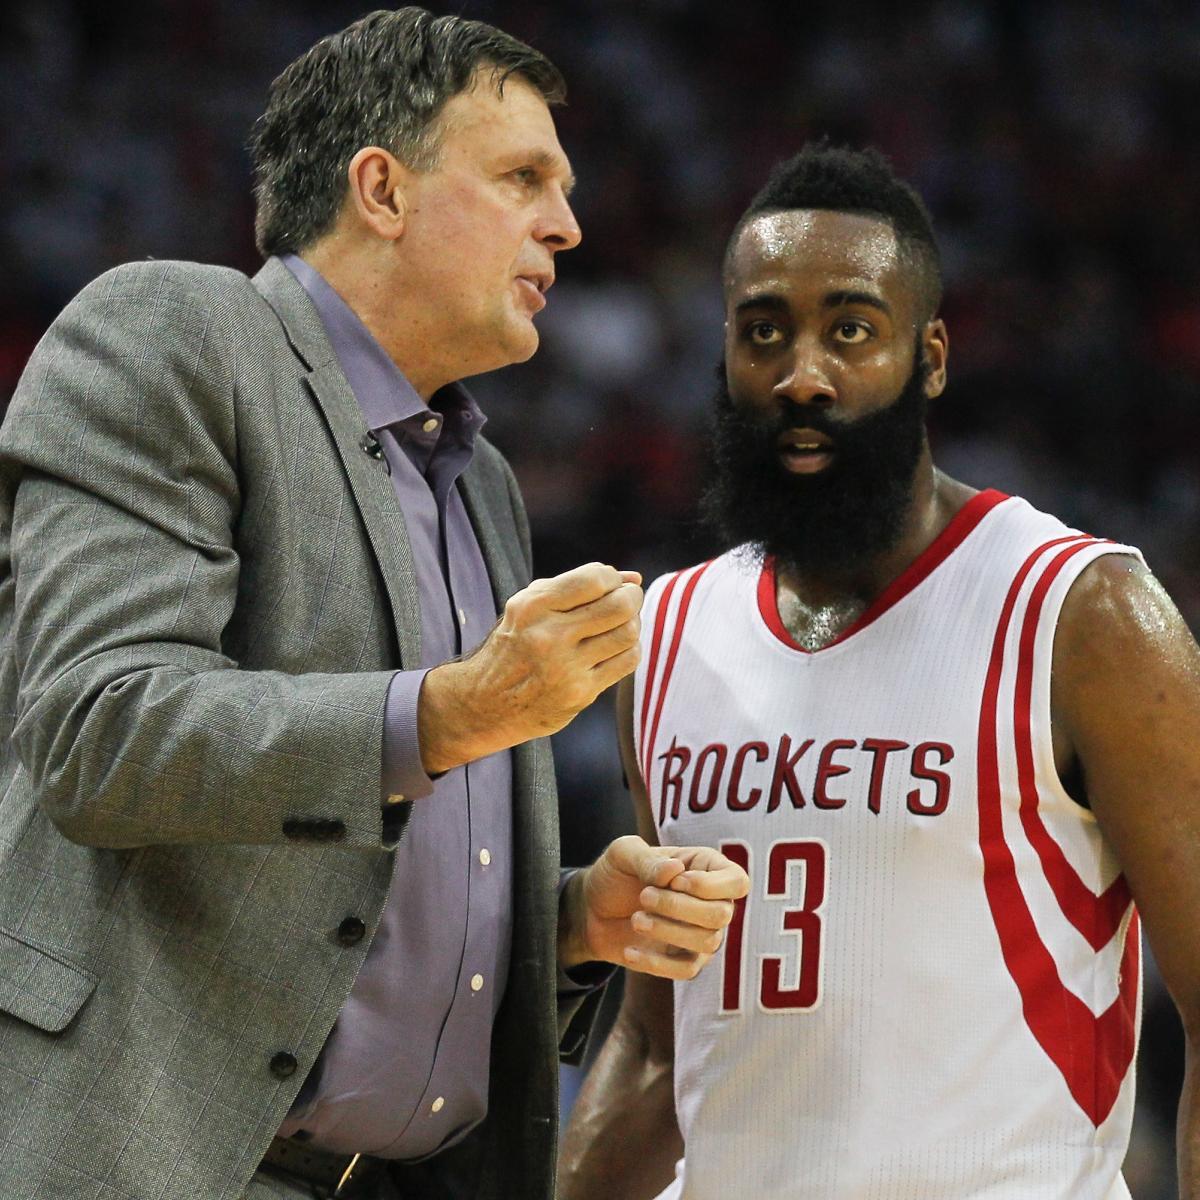 Houston Rockets Defensive Coach: Kevin McHale Says James Harden 'Not A Leader' For Rockets